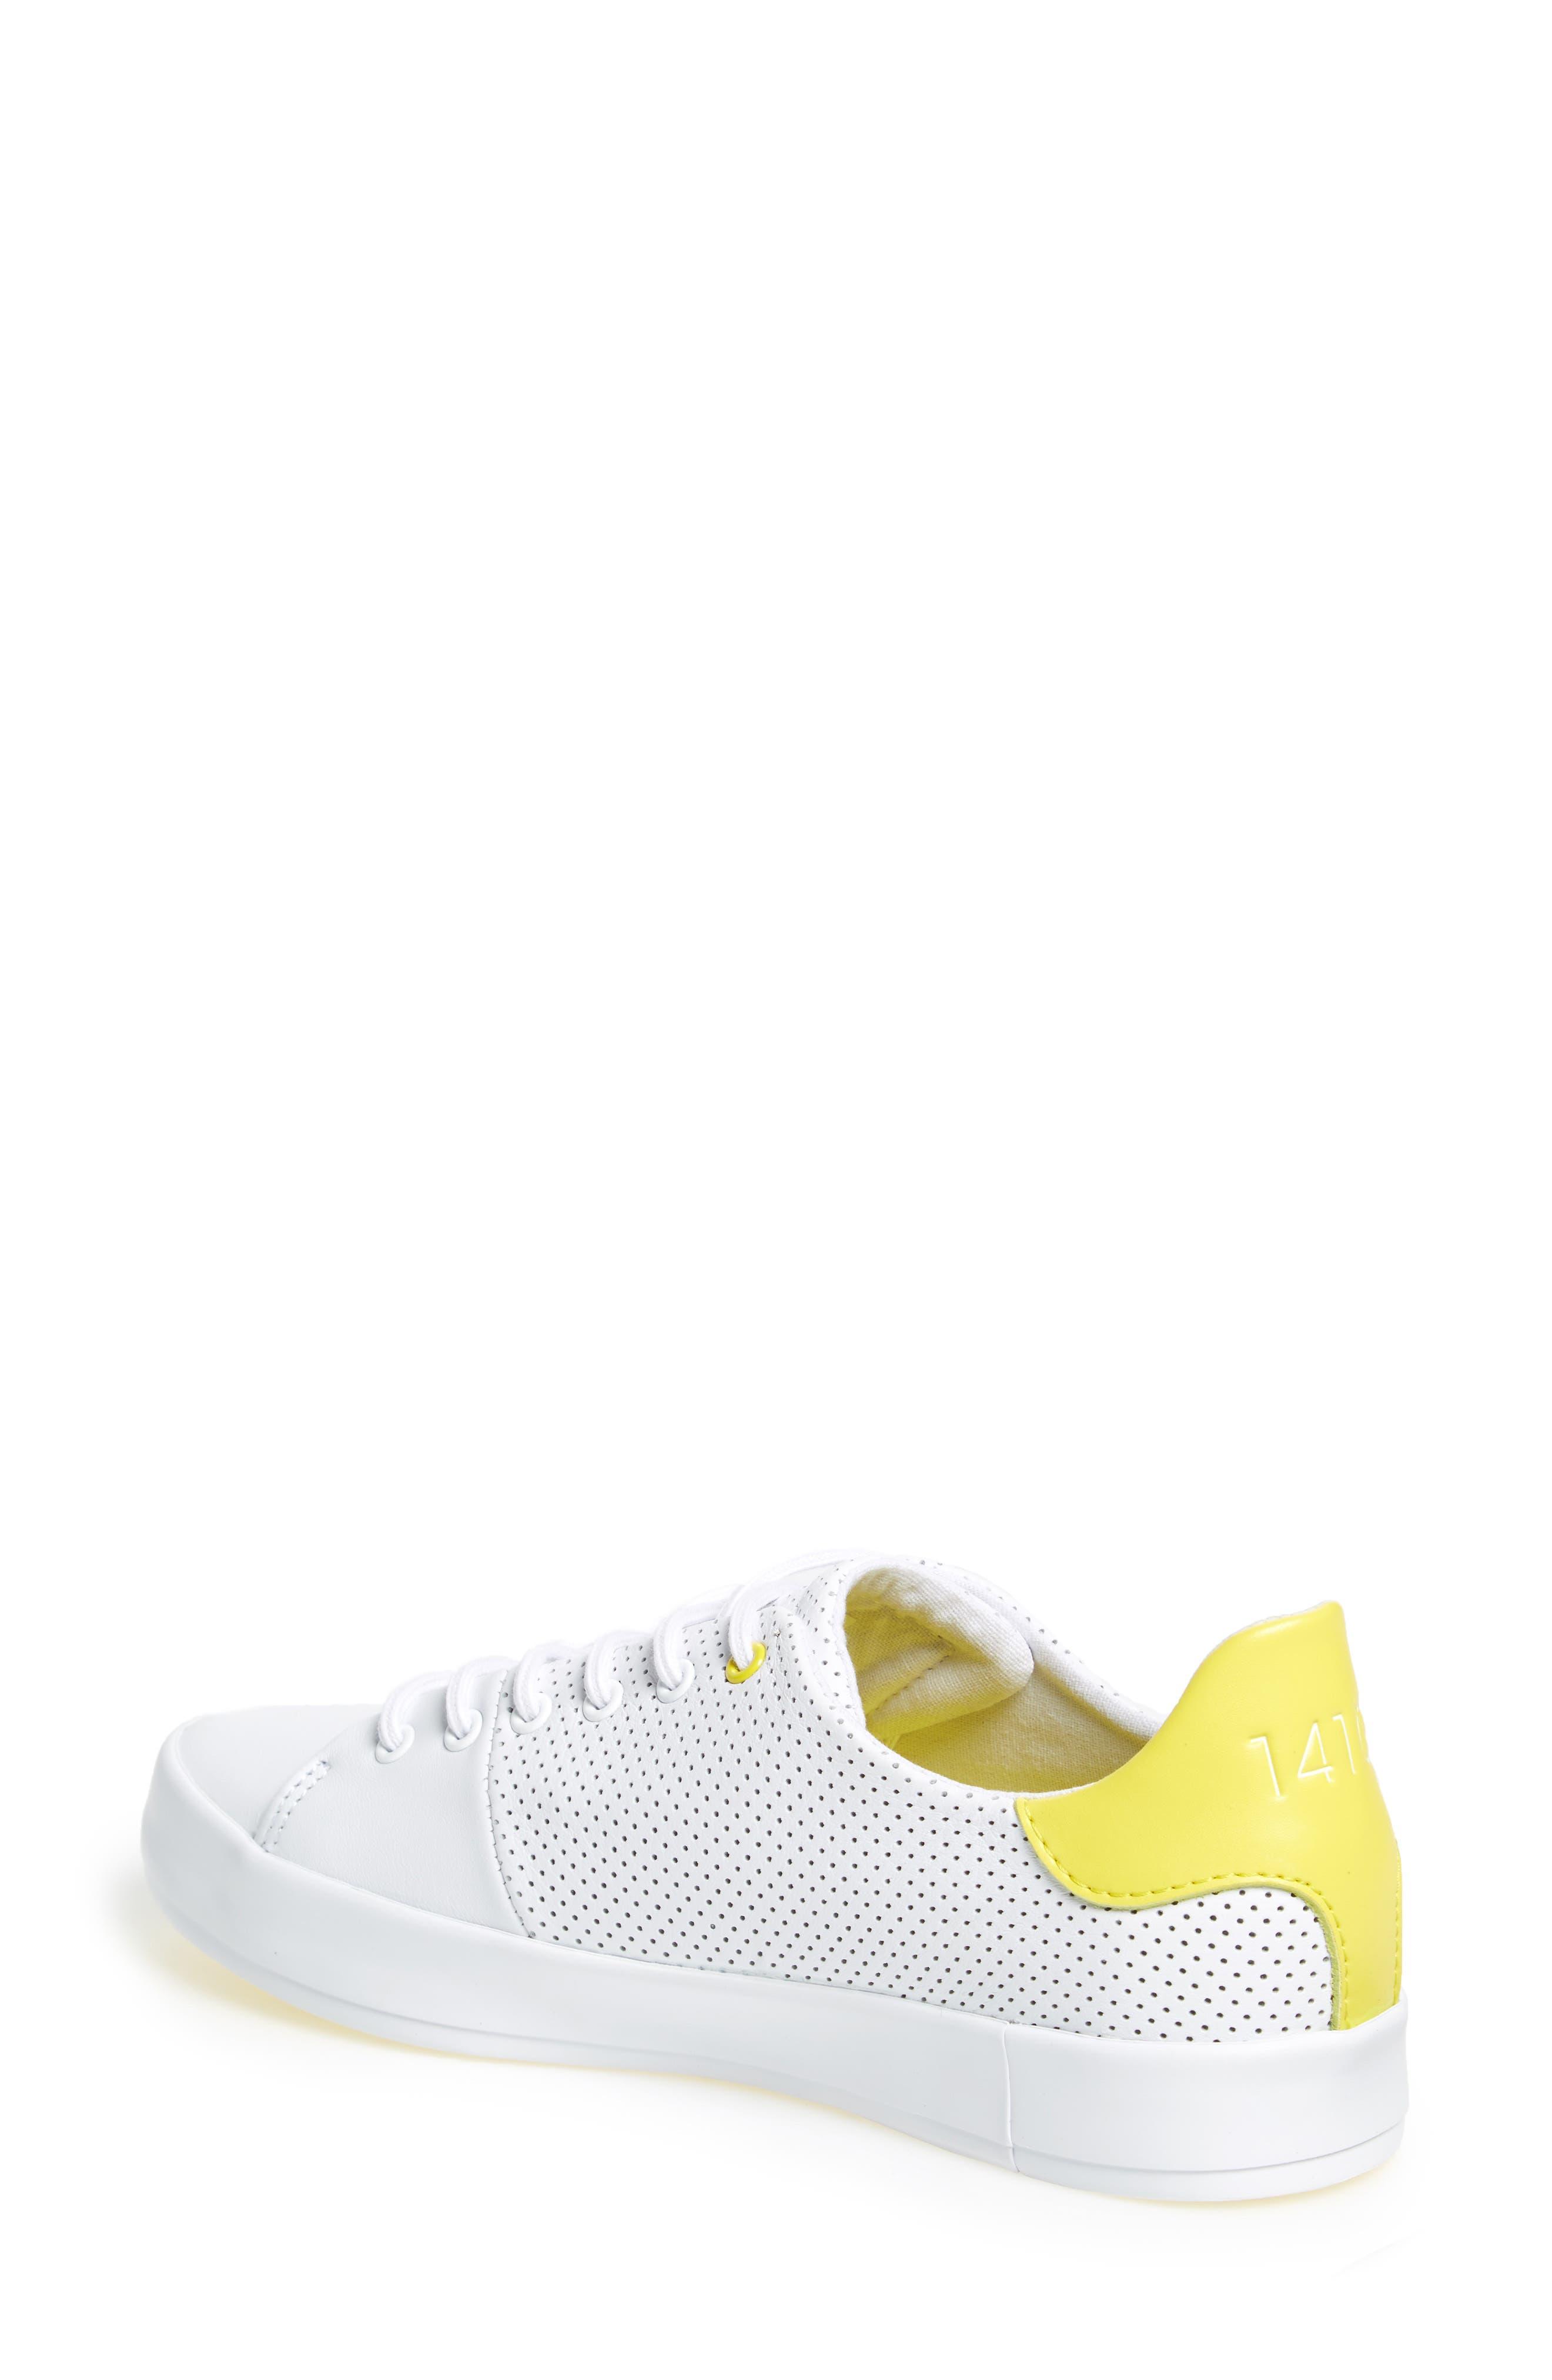 Alternate Image 2  - Creative Recreation x Nick Jonas Carda Perforated Sneaker (Women)